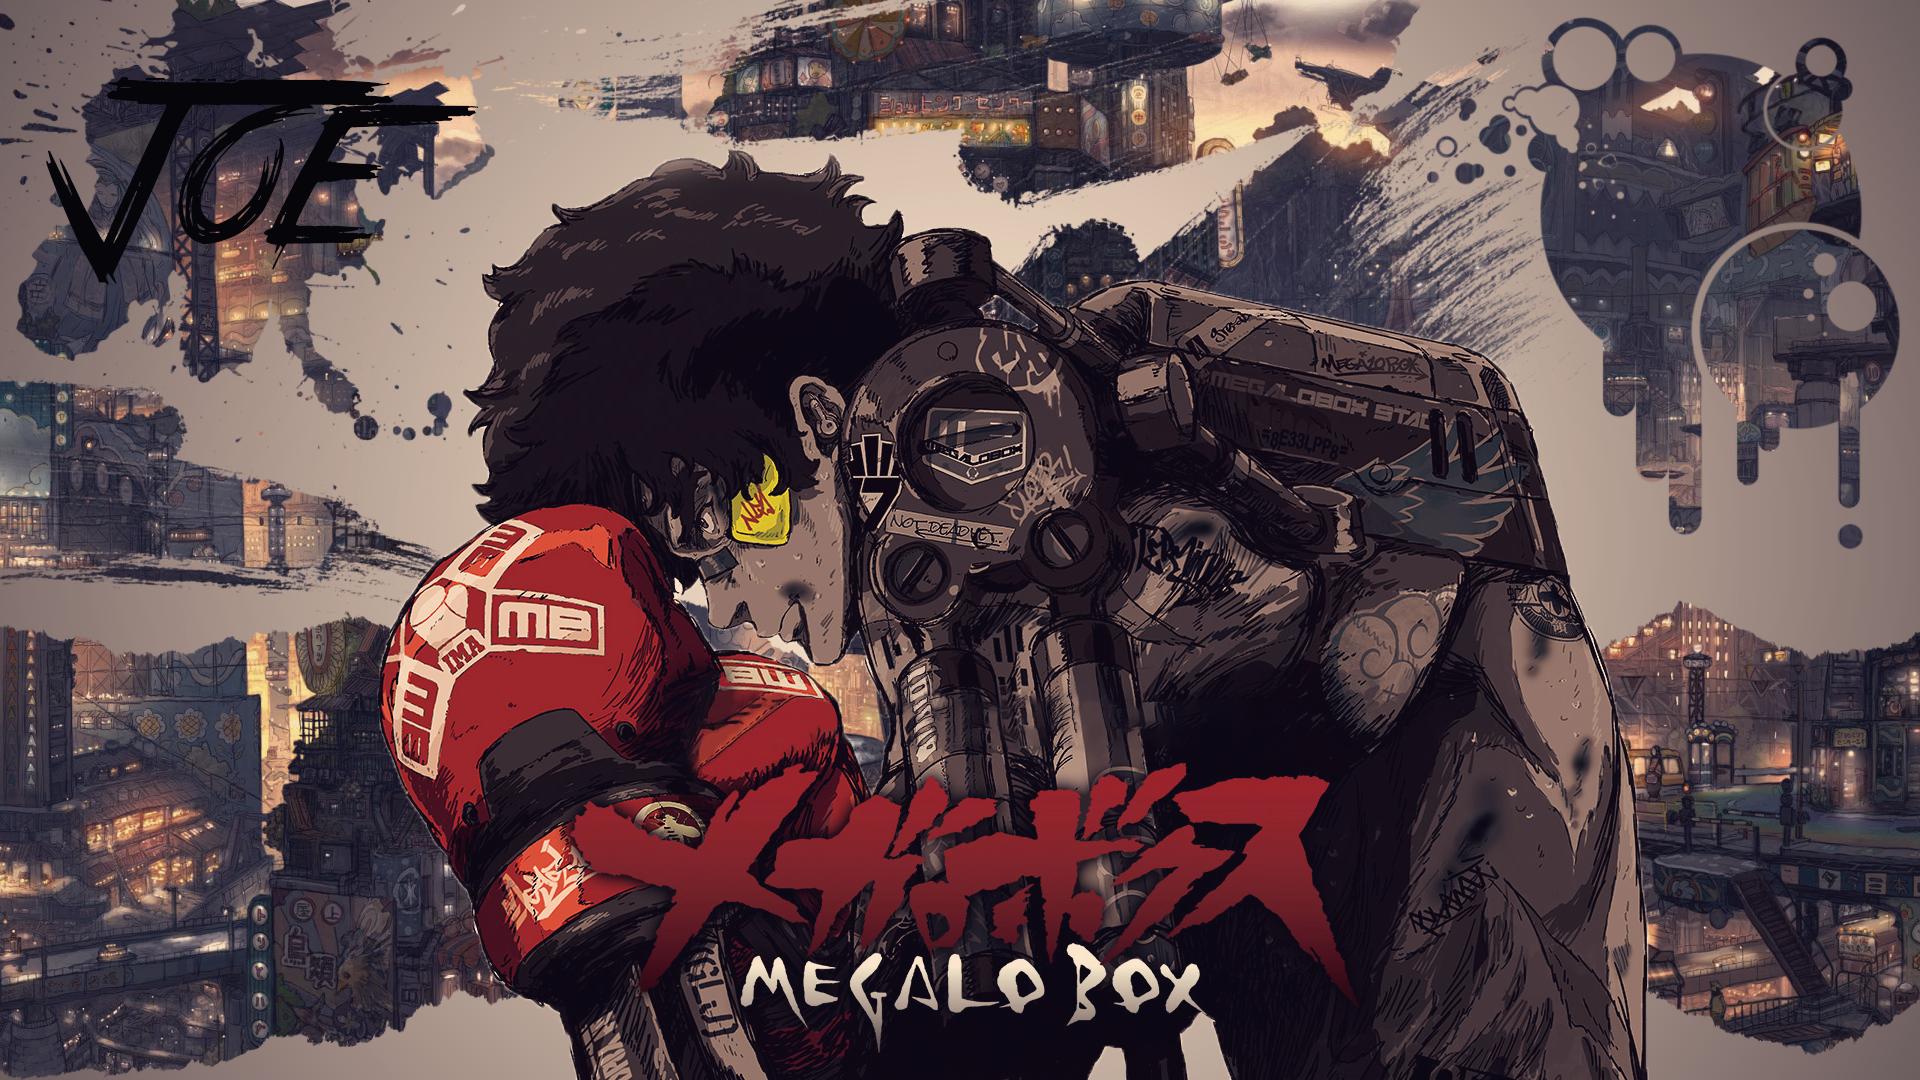 Megalo Box - Anime Wallpaper by morgy902 on DeviantArt